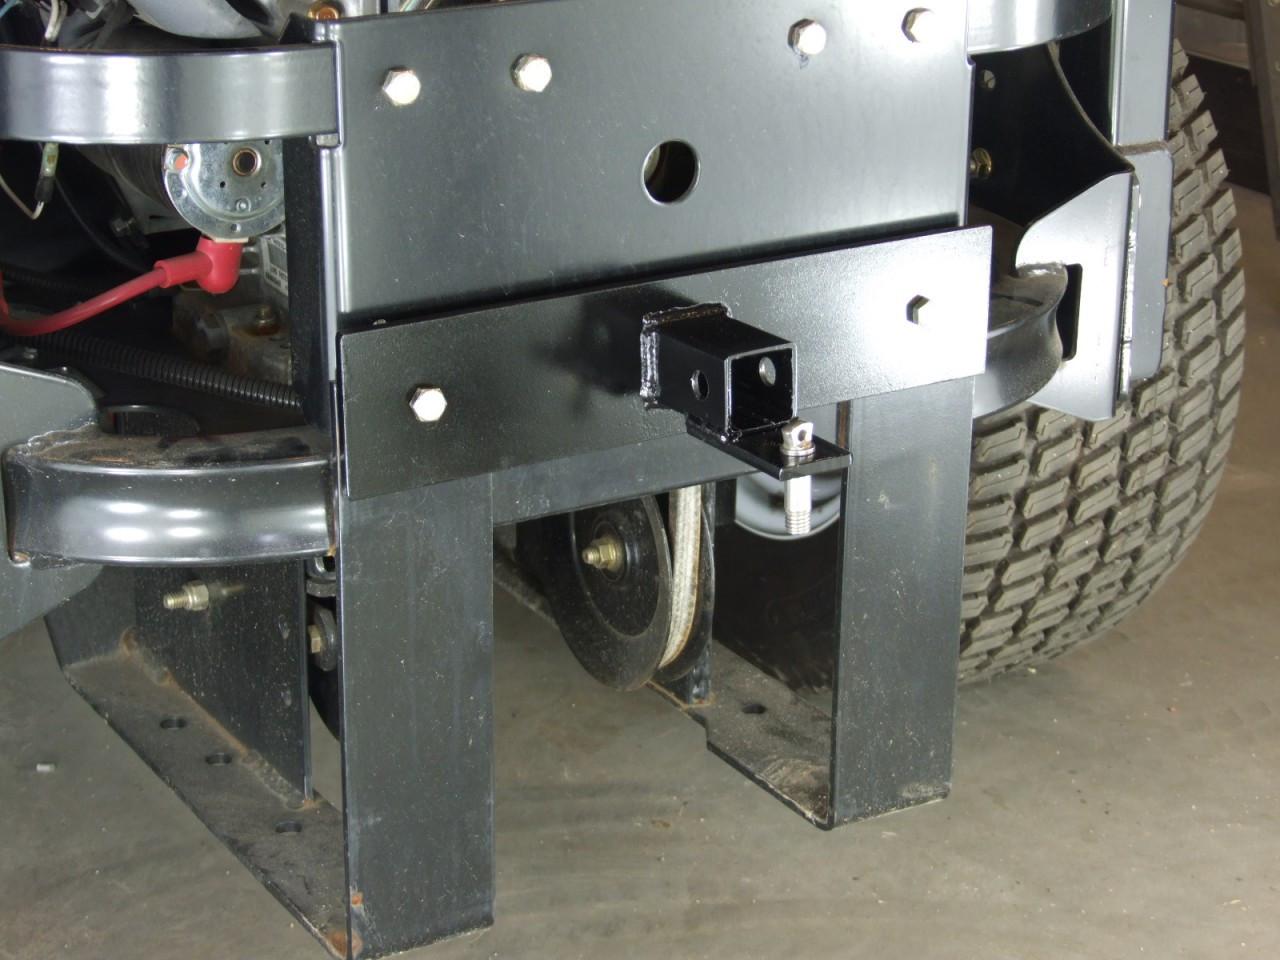 Toro Zero Turn Lawn Mower Hitch 1¼ inch receiver trailer hitches